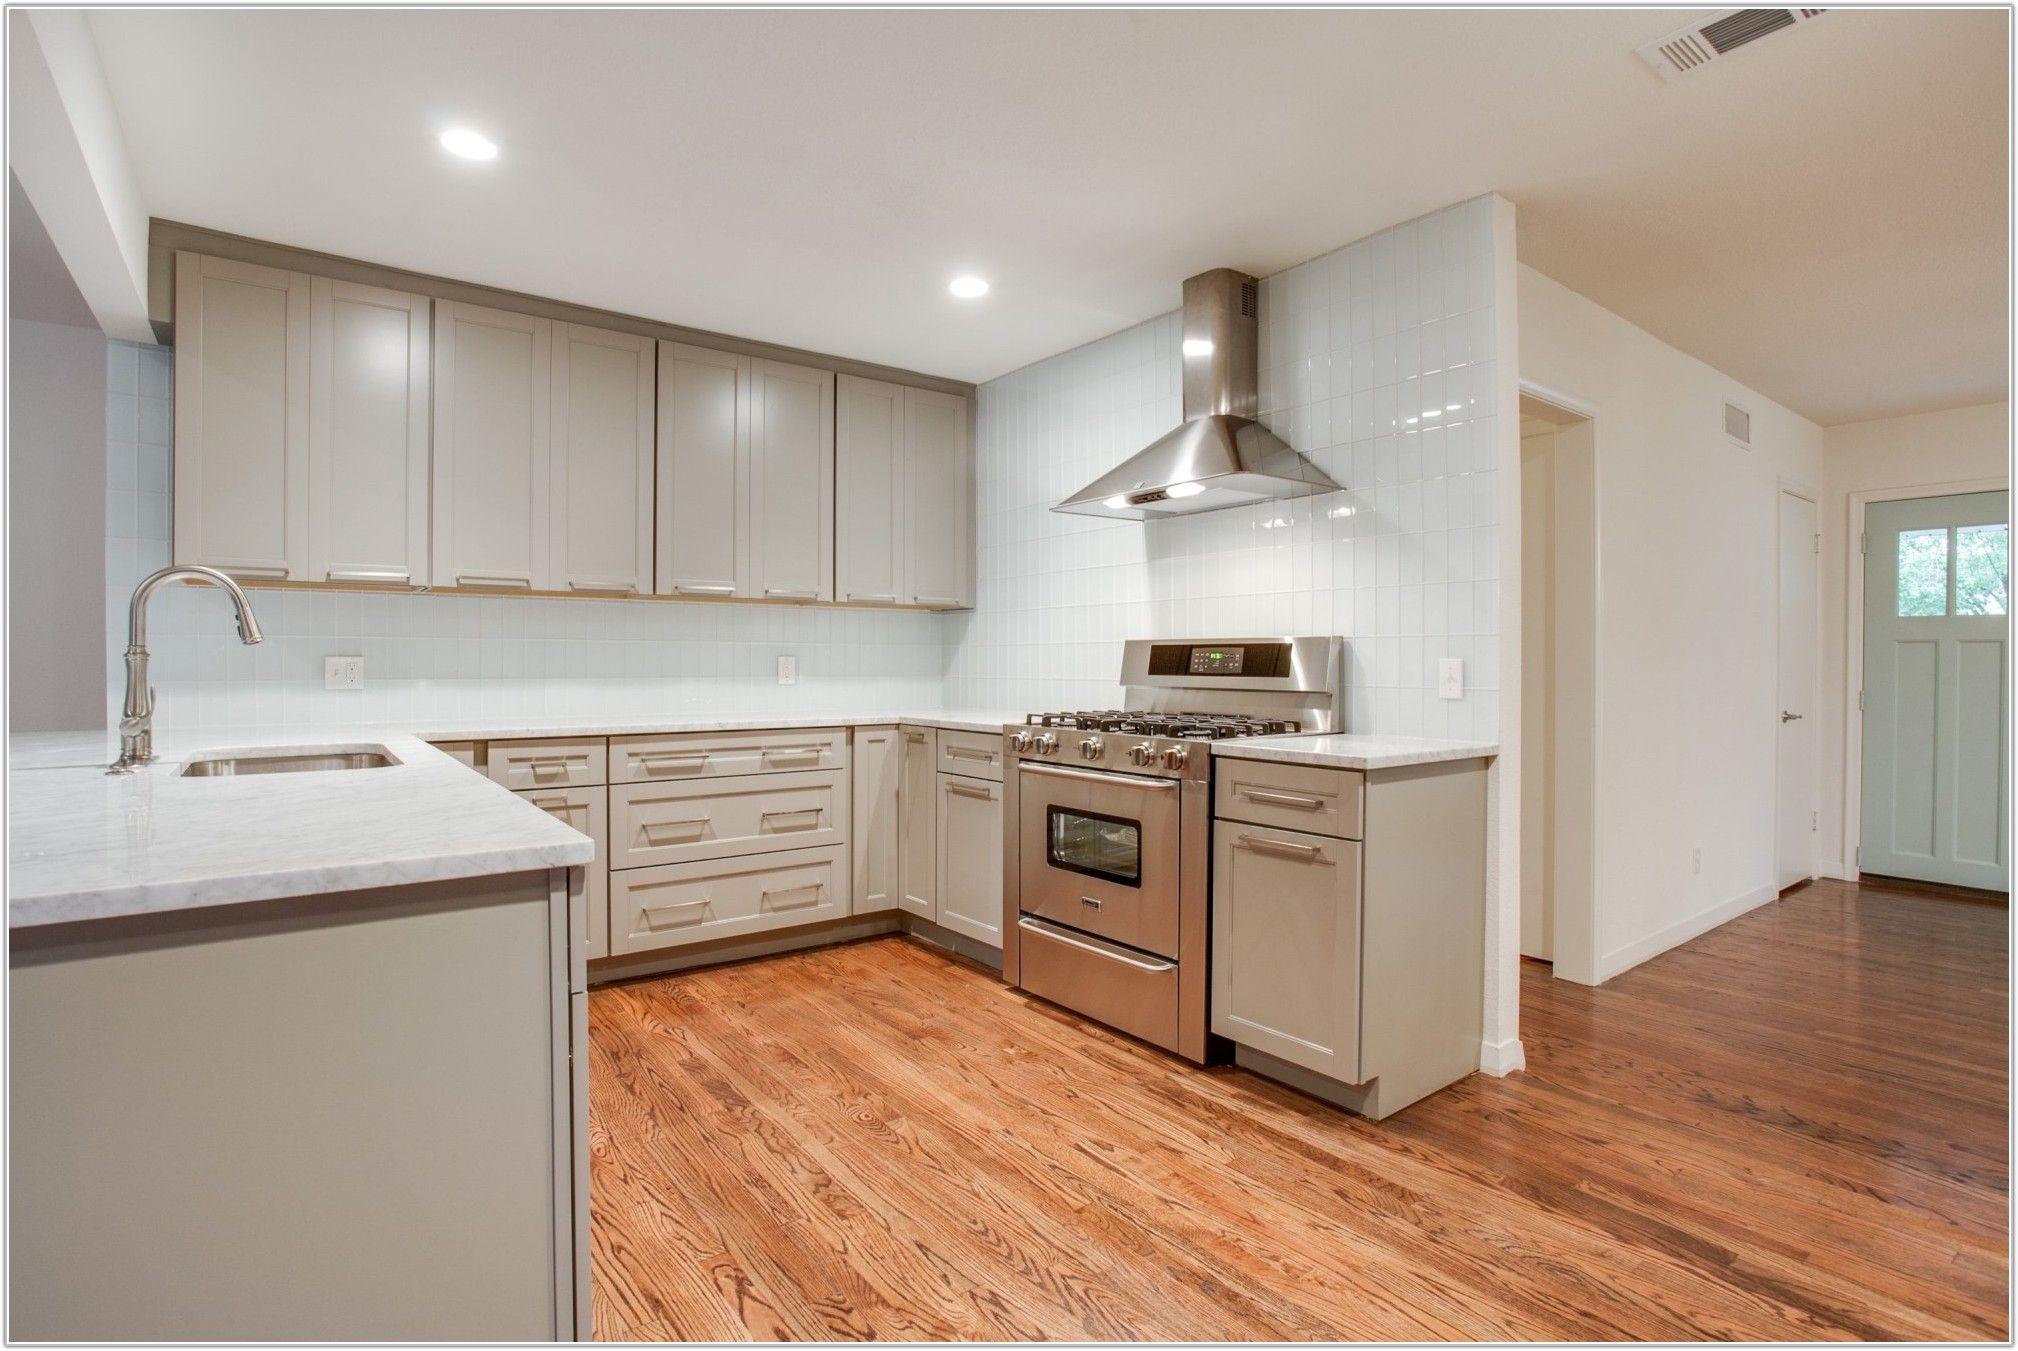 tile backsplash kitchen with installing ceramic many the trendy